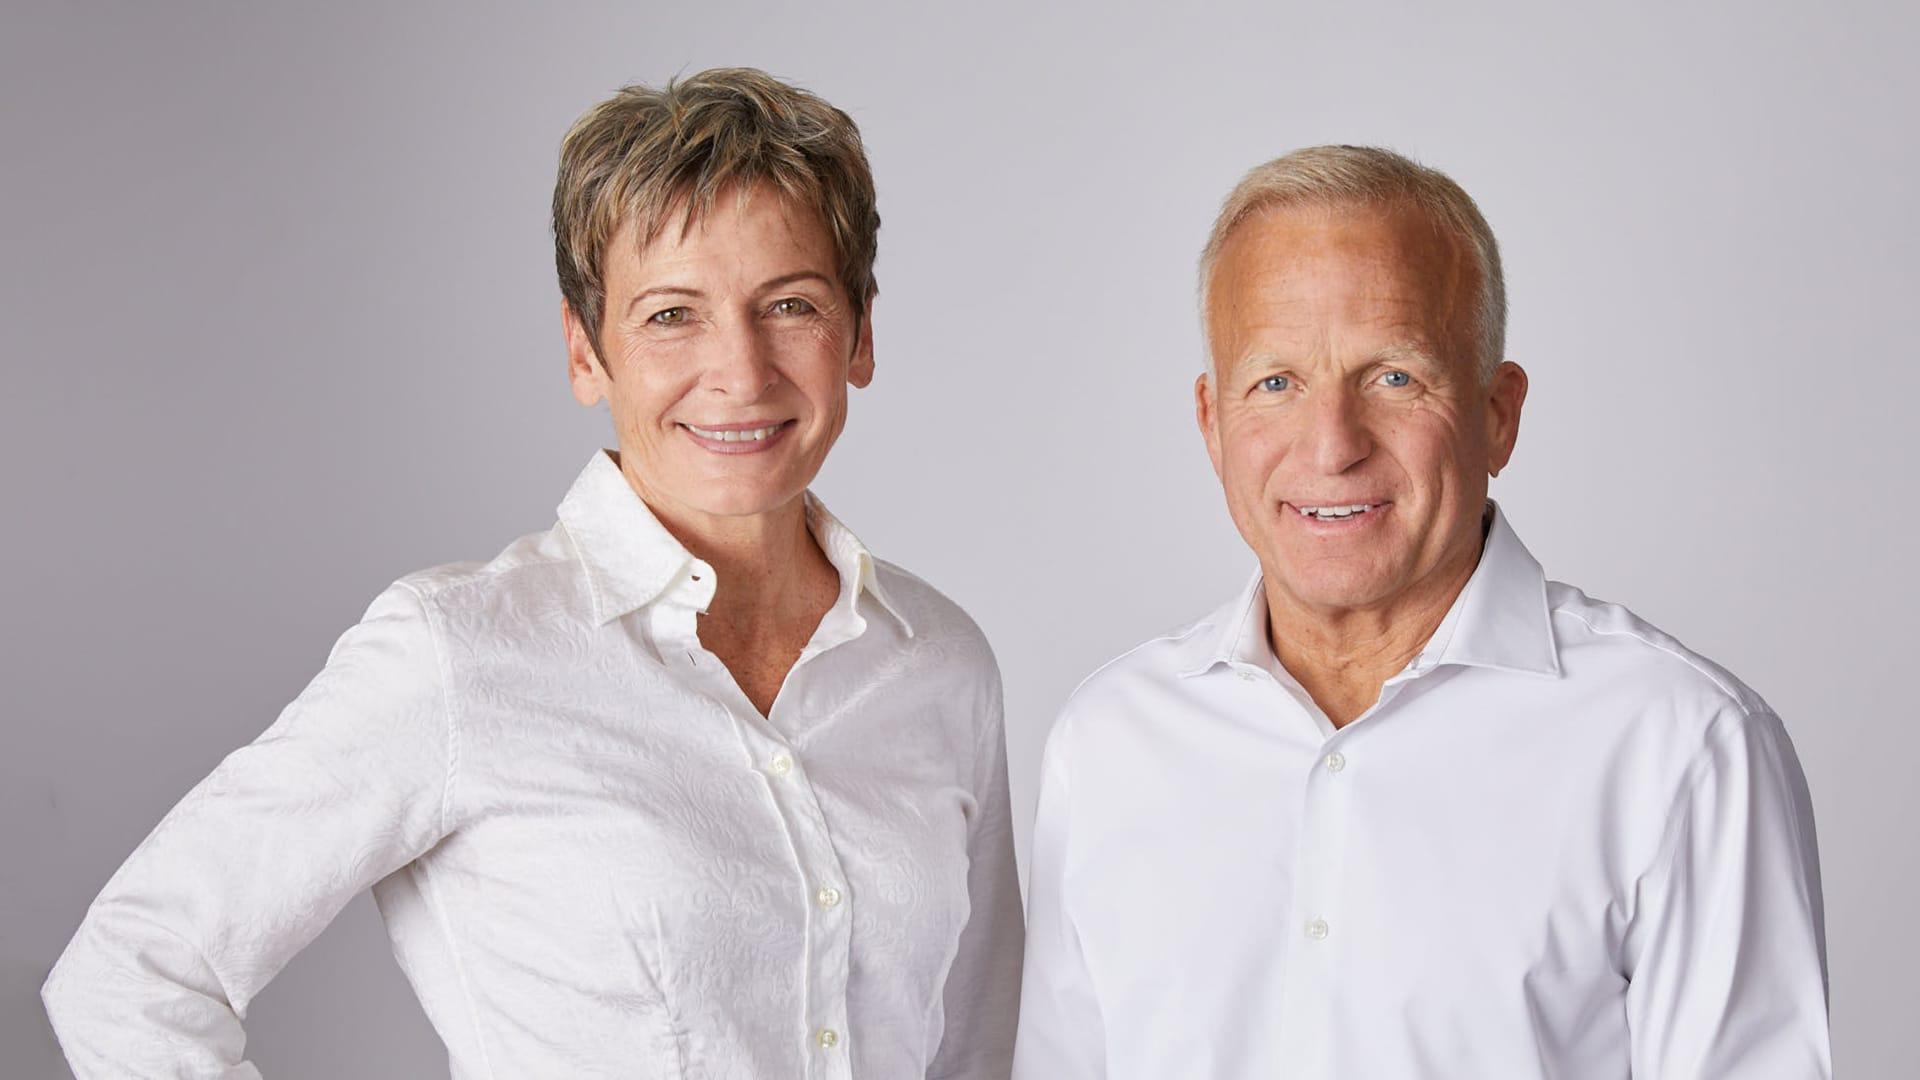 Peggy Whitson, left, and John Shoffner